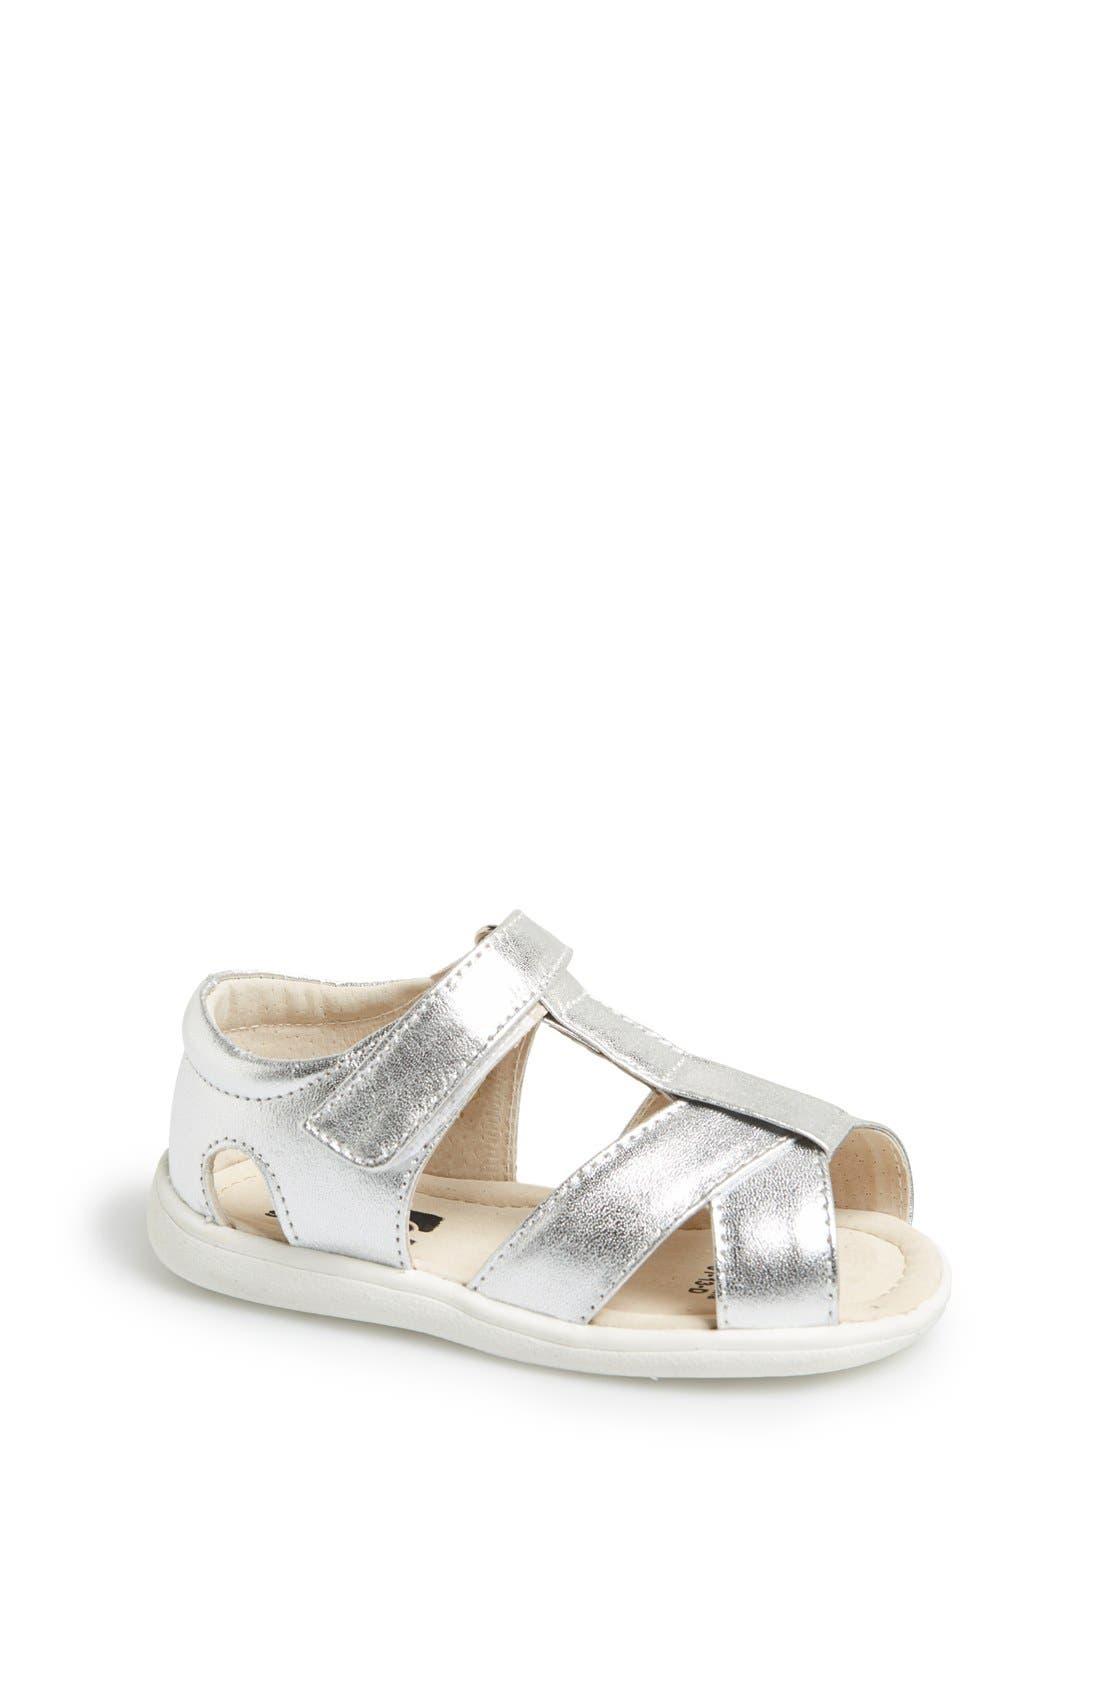 Main Image - See Kai Run 'Everly' Metallic Leather Sandal (Baby & Walker)